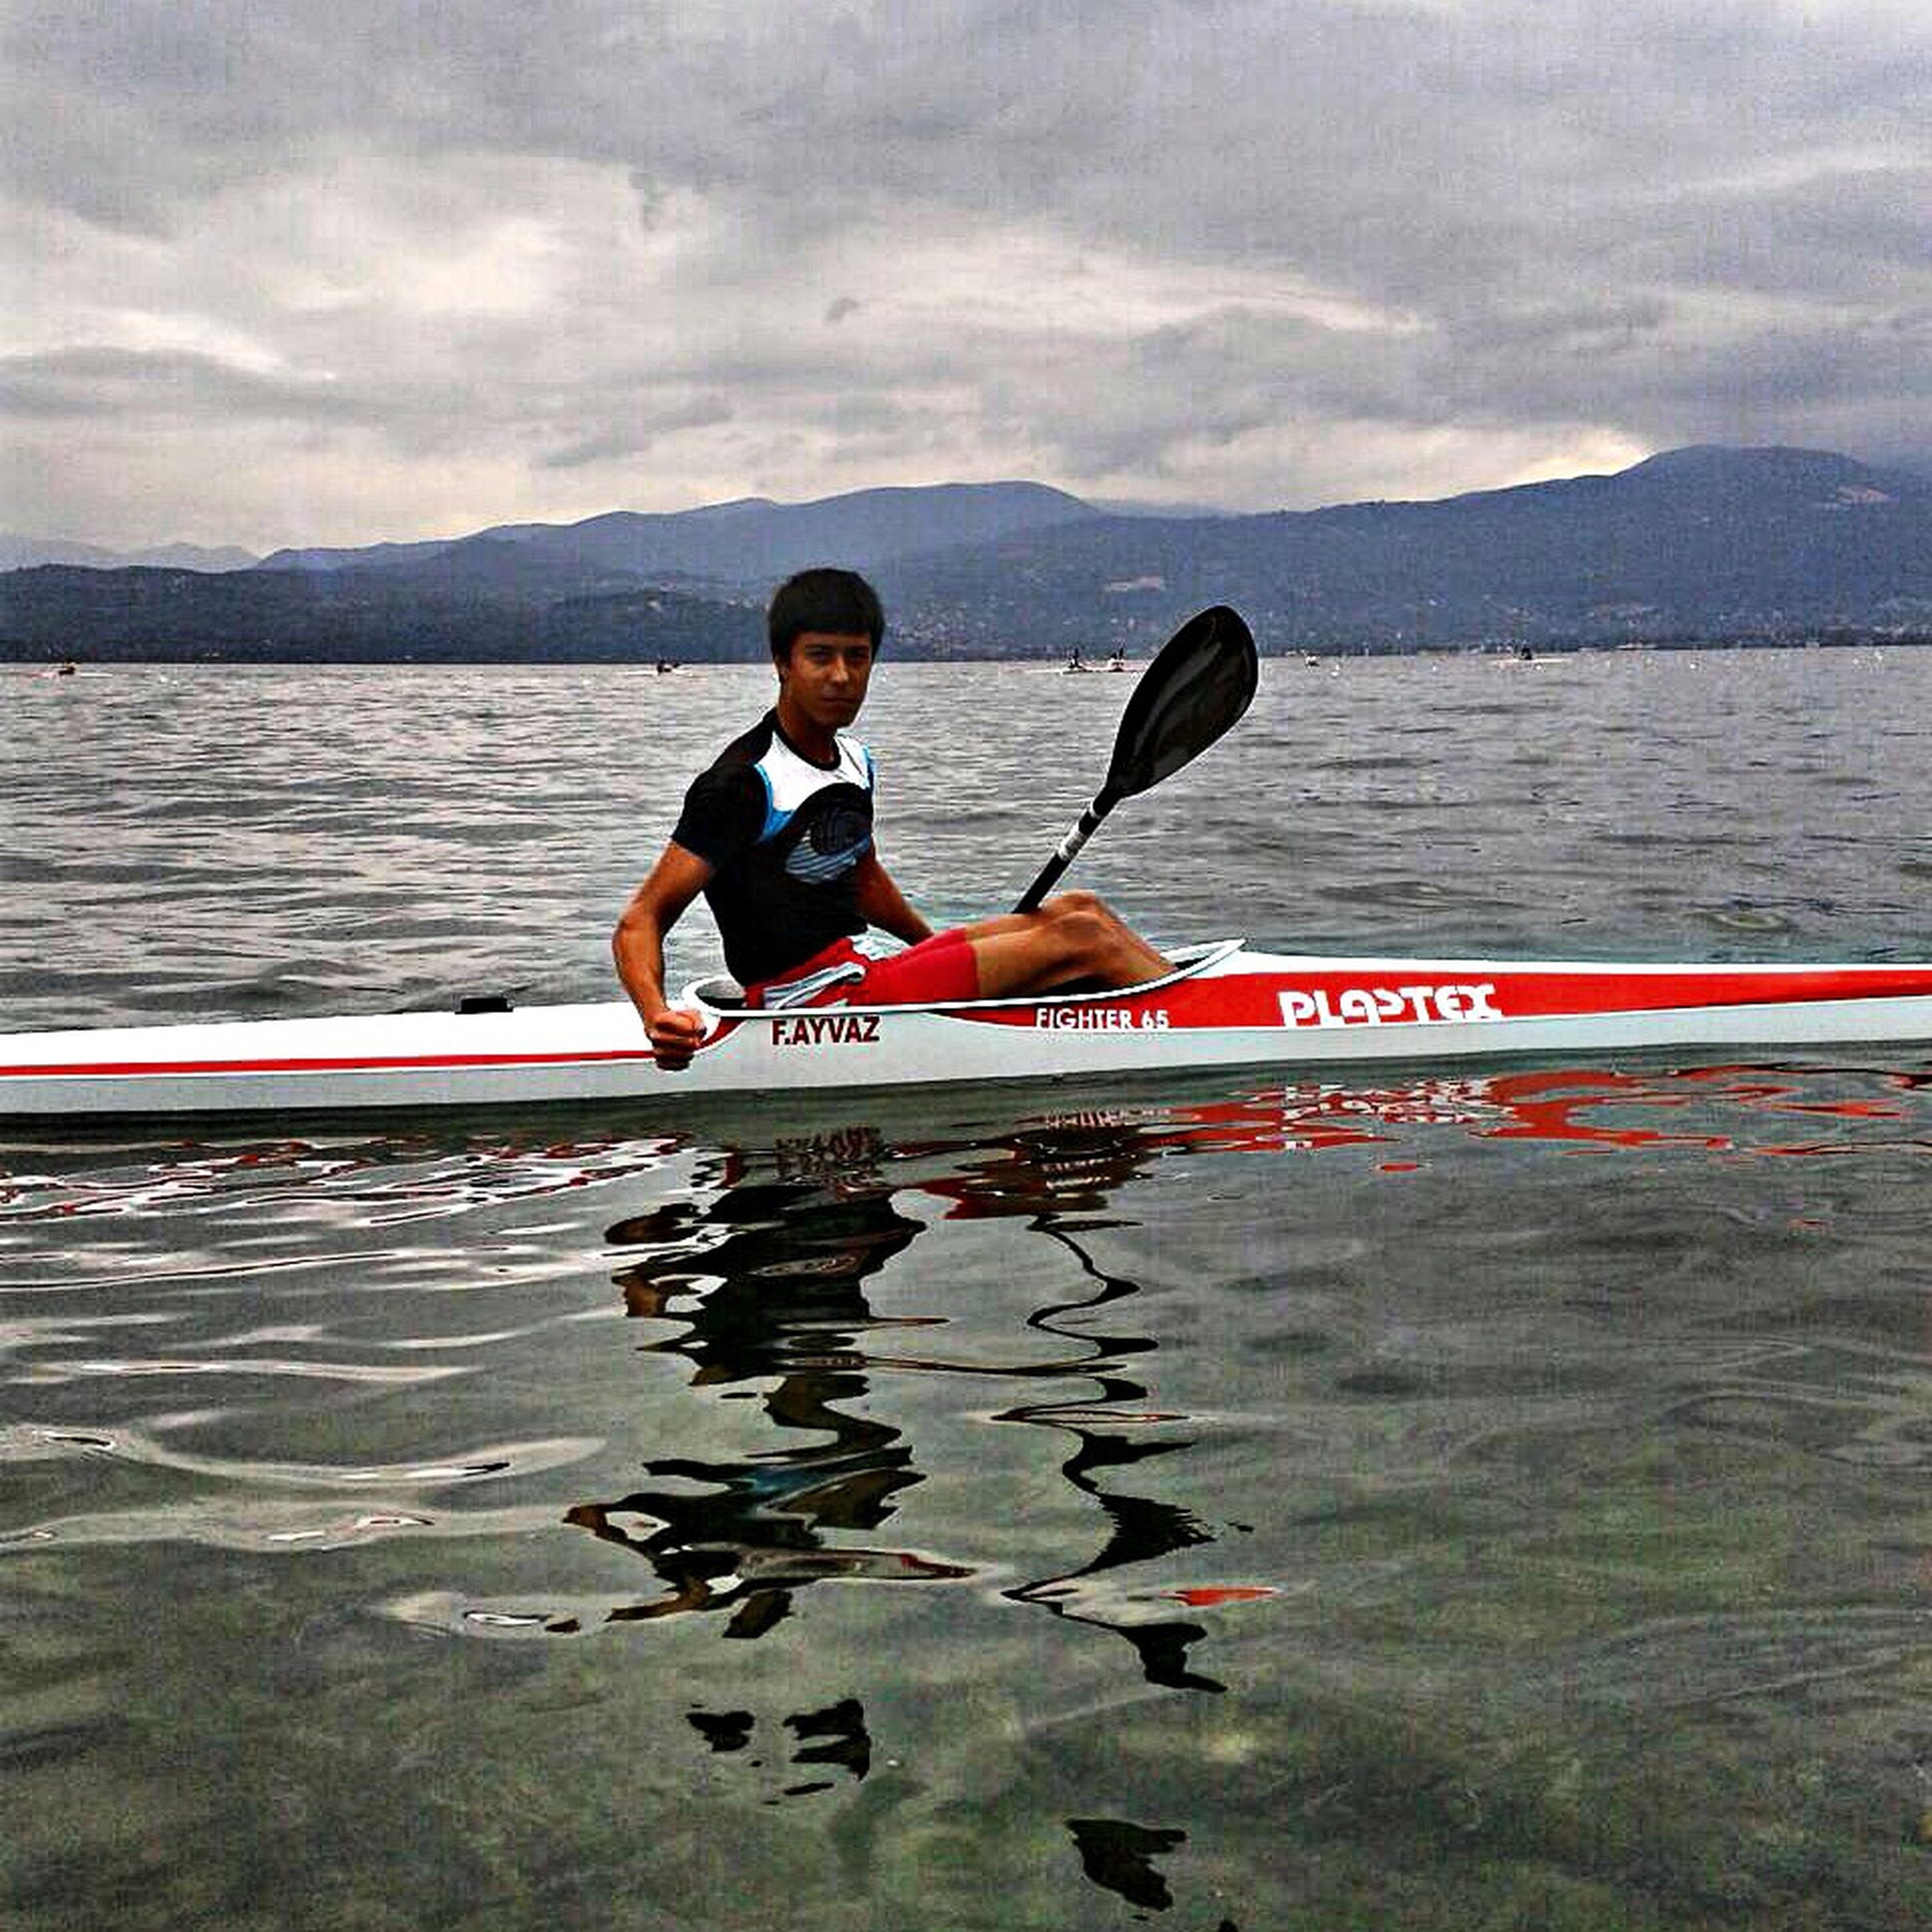 Canoe kayak racing